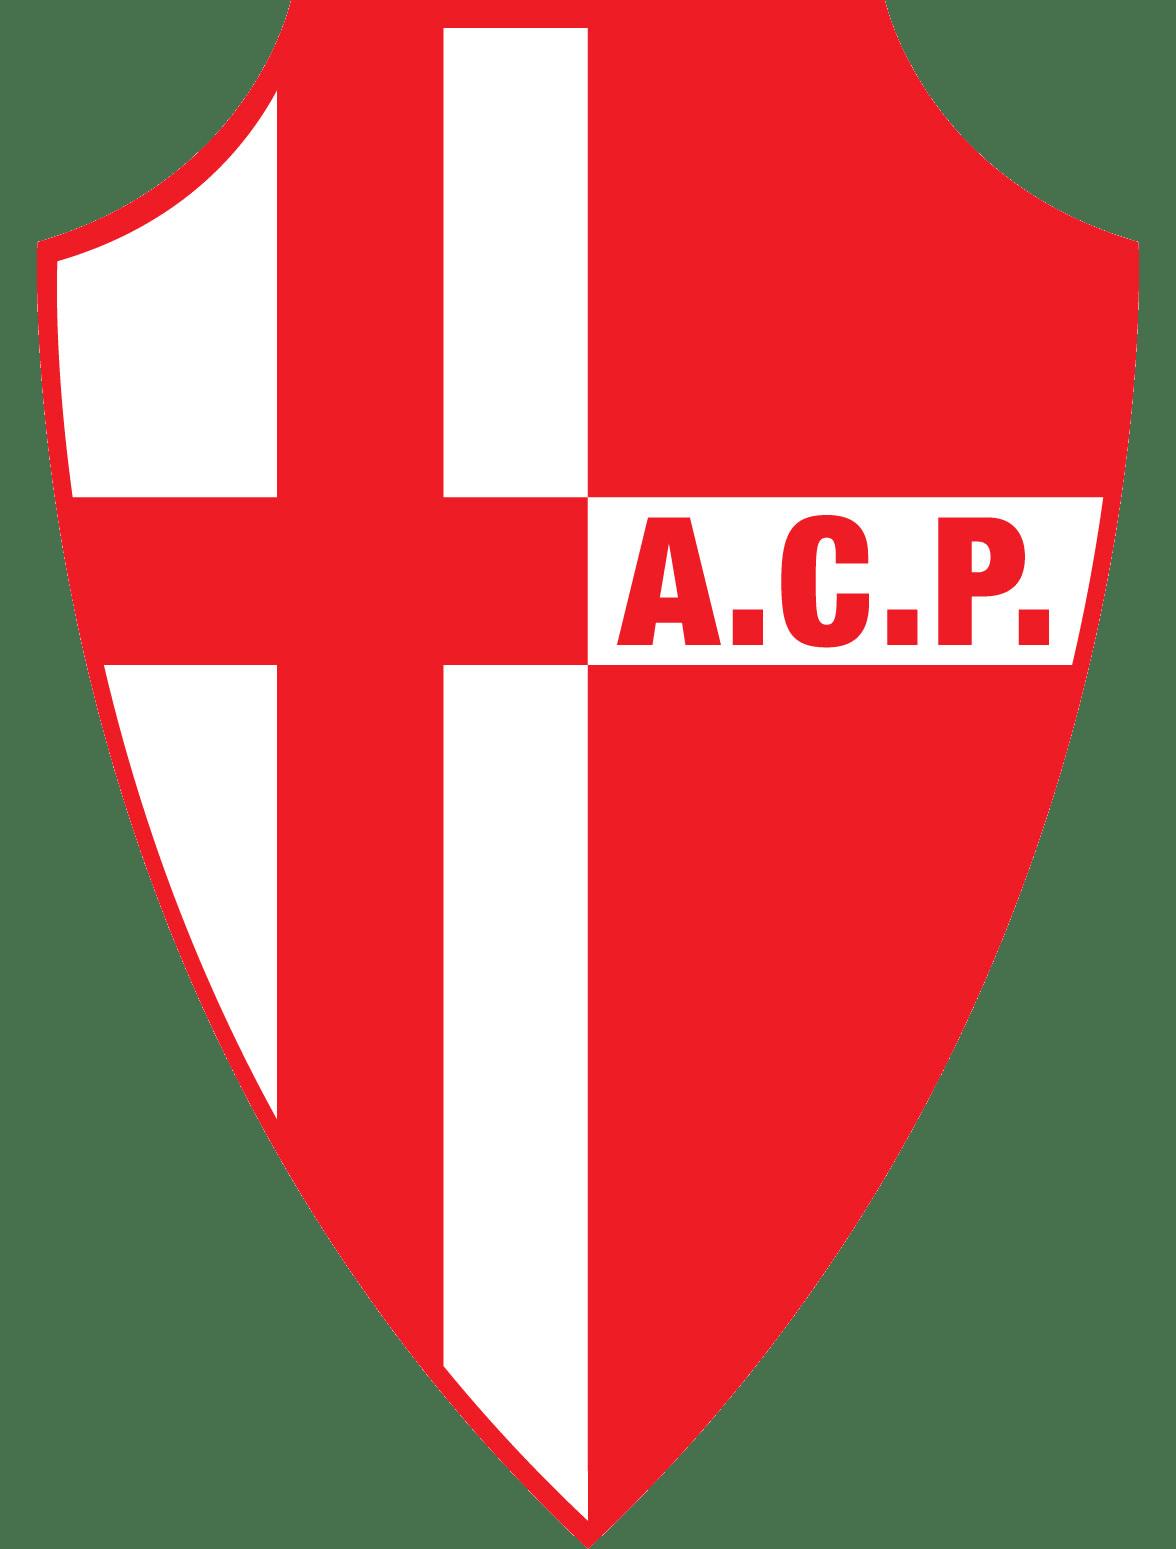 Sponsor Padova Calcio Azienda Vinicola Revini